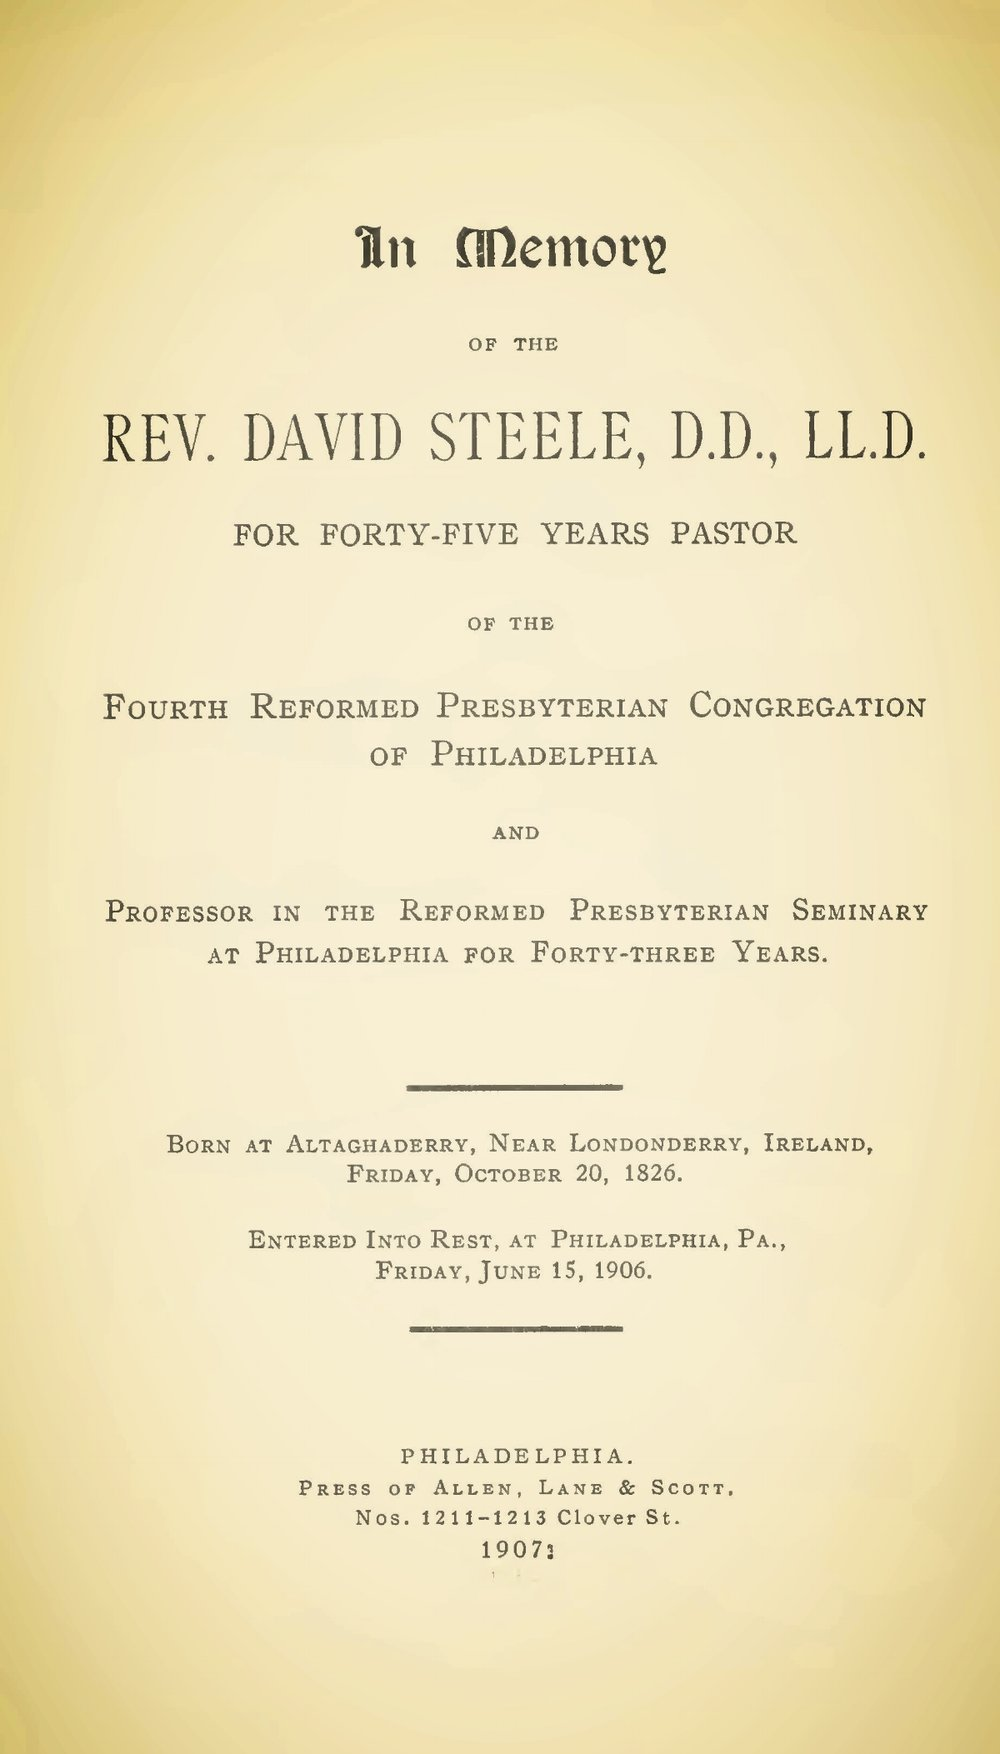 Steele, David, In Memory of the Rev. David Steele, D.D., L.L.D. TItle Page.jpg